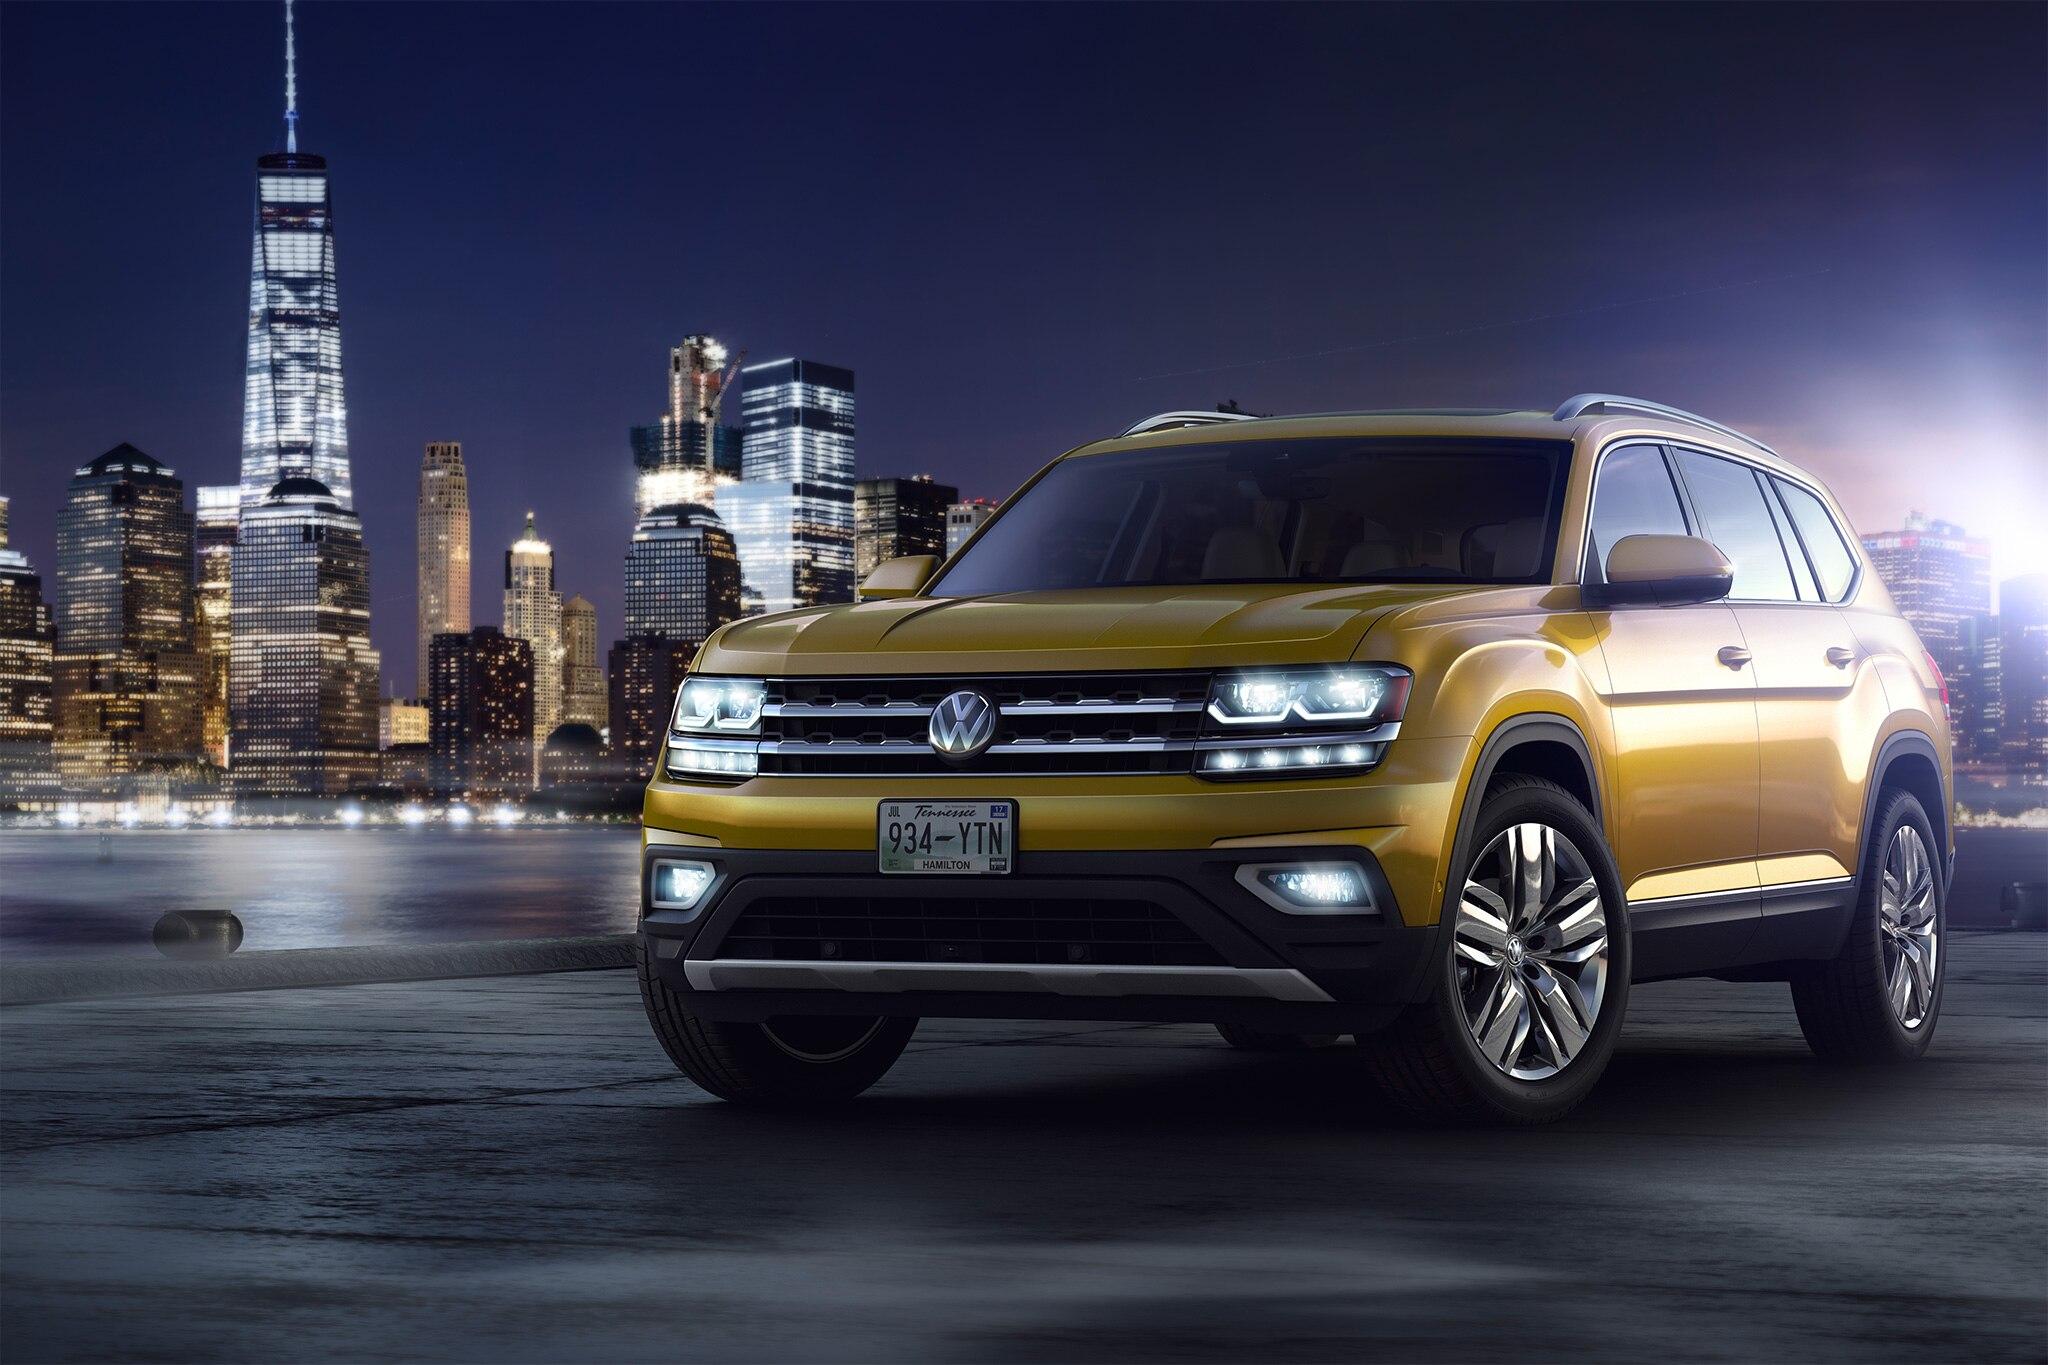 2018 Volkswagen Atlas Gets a Green Light | Automobile Magazine